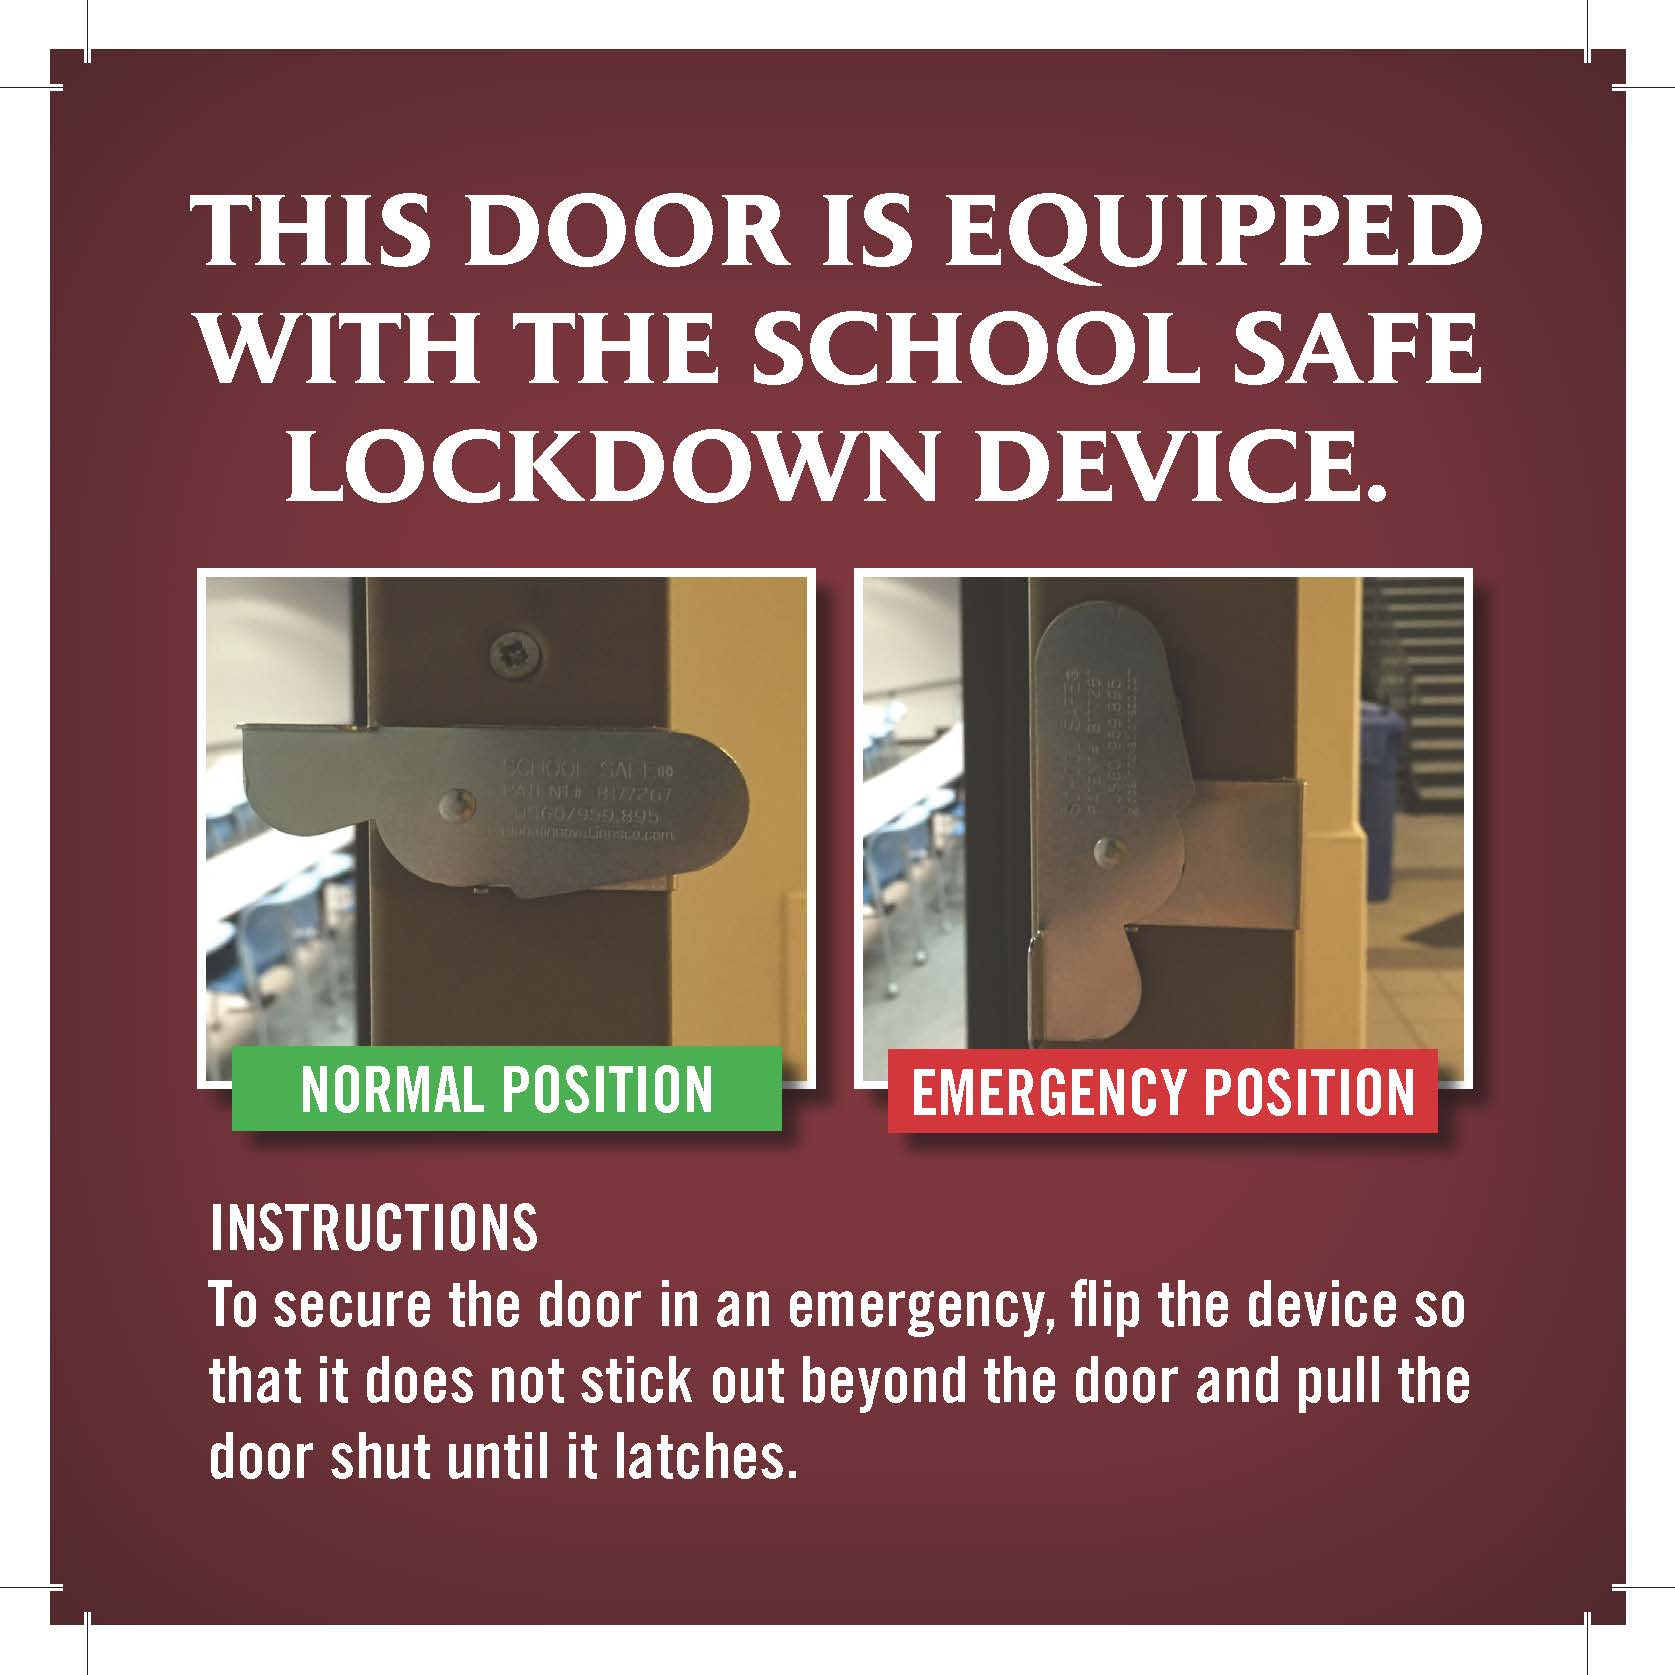 School Safe Lockdown Device